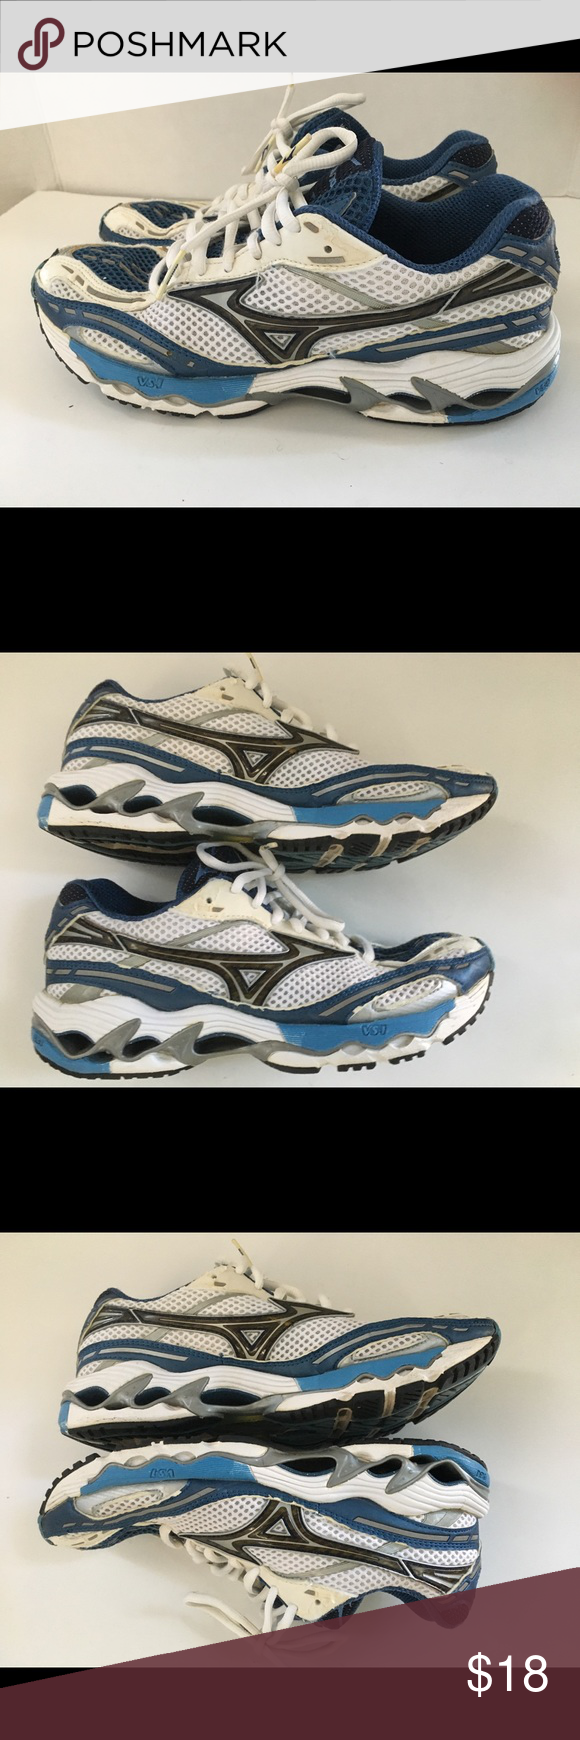 mizuno x10 womens running shoes online